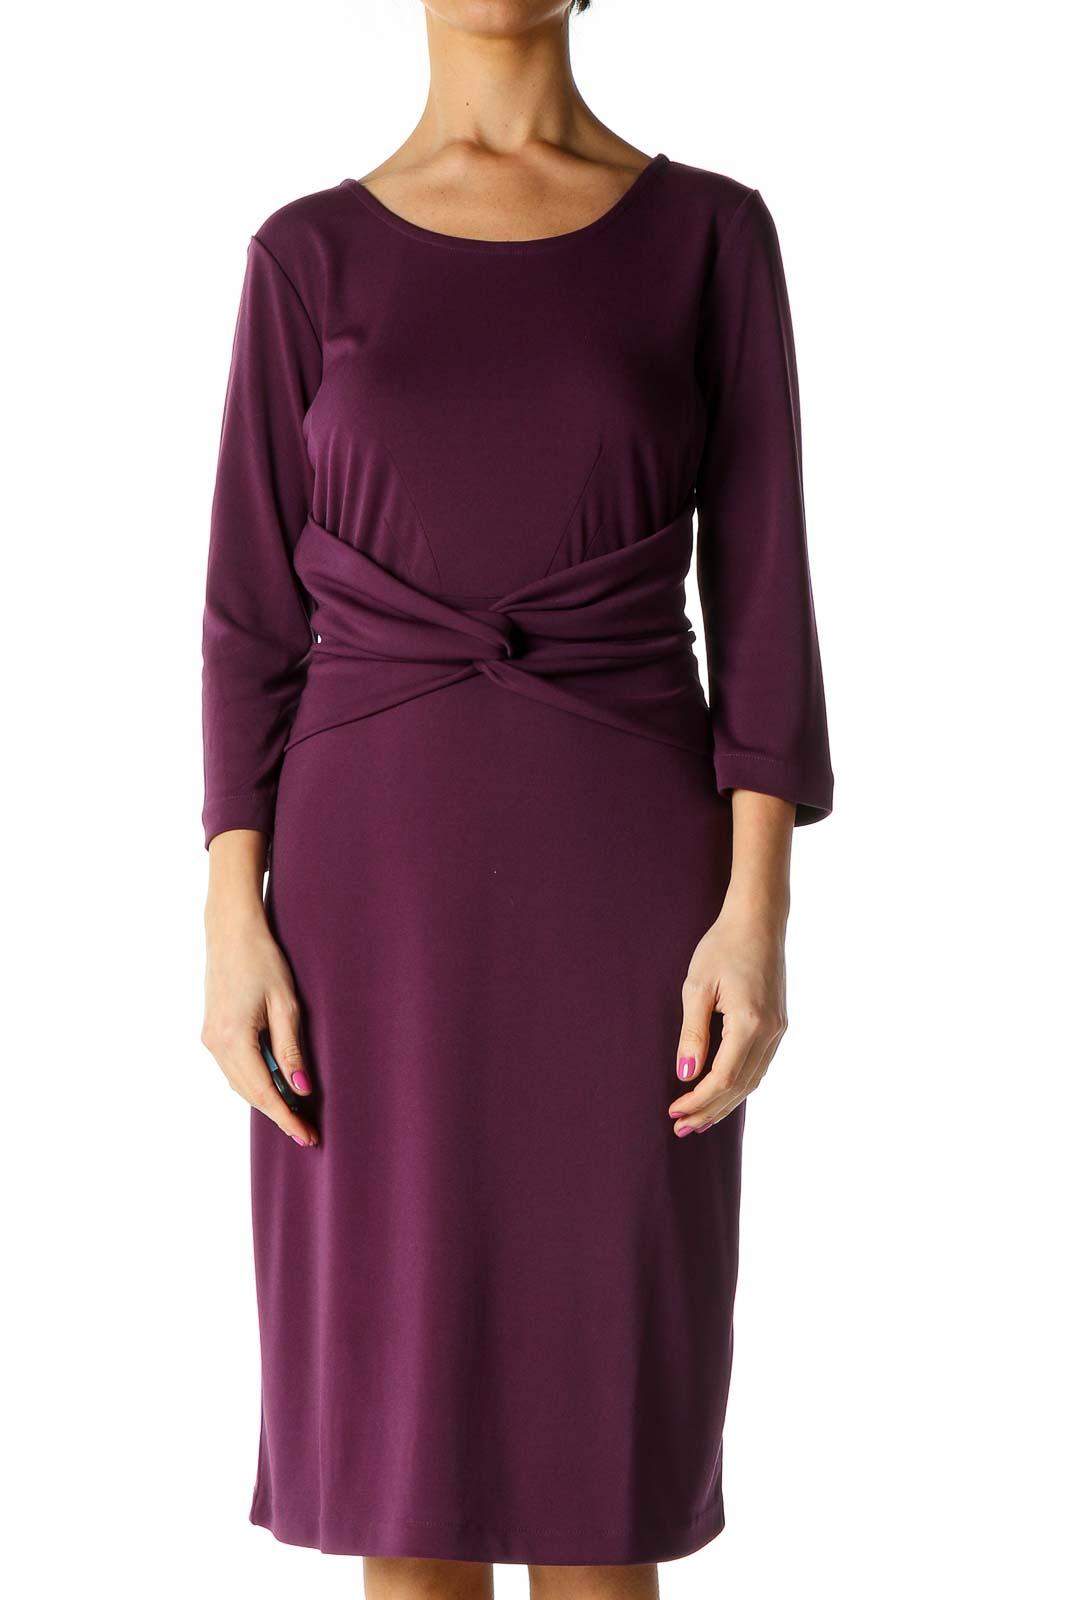 Purple Solid Retro Shift Dress Front